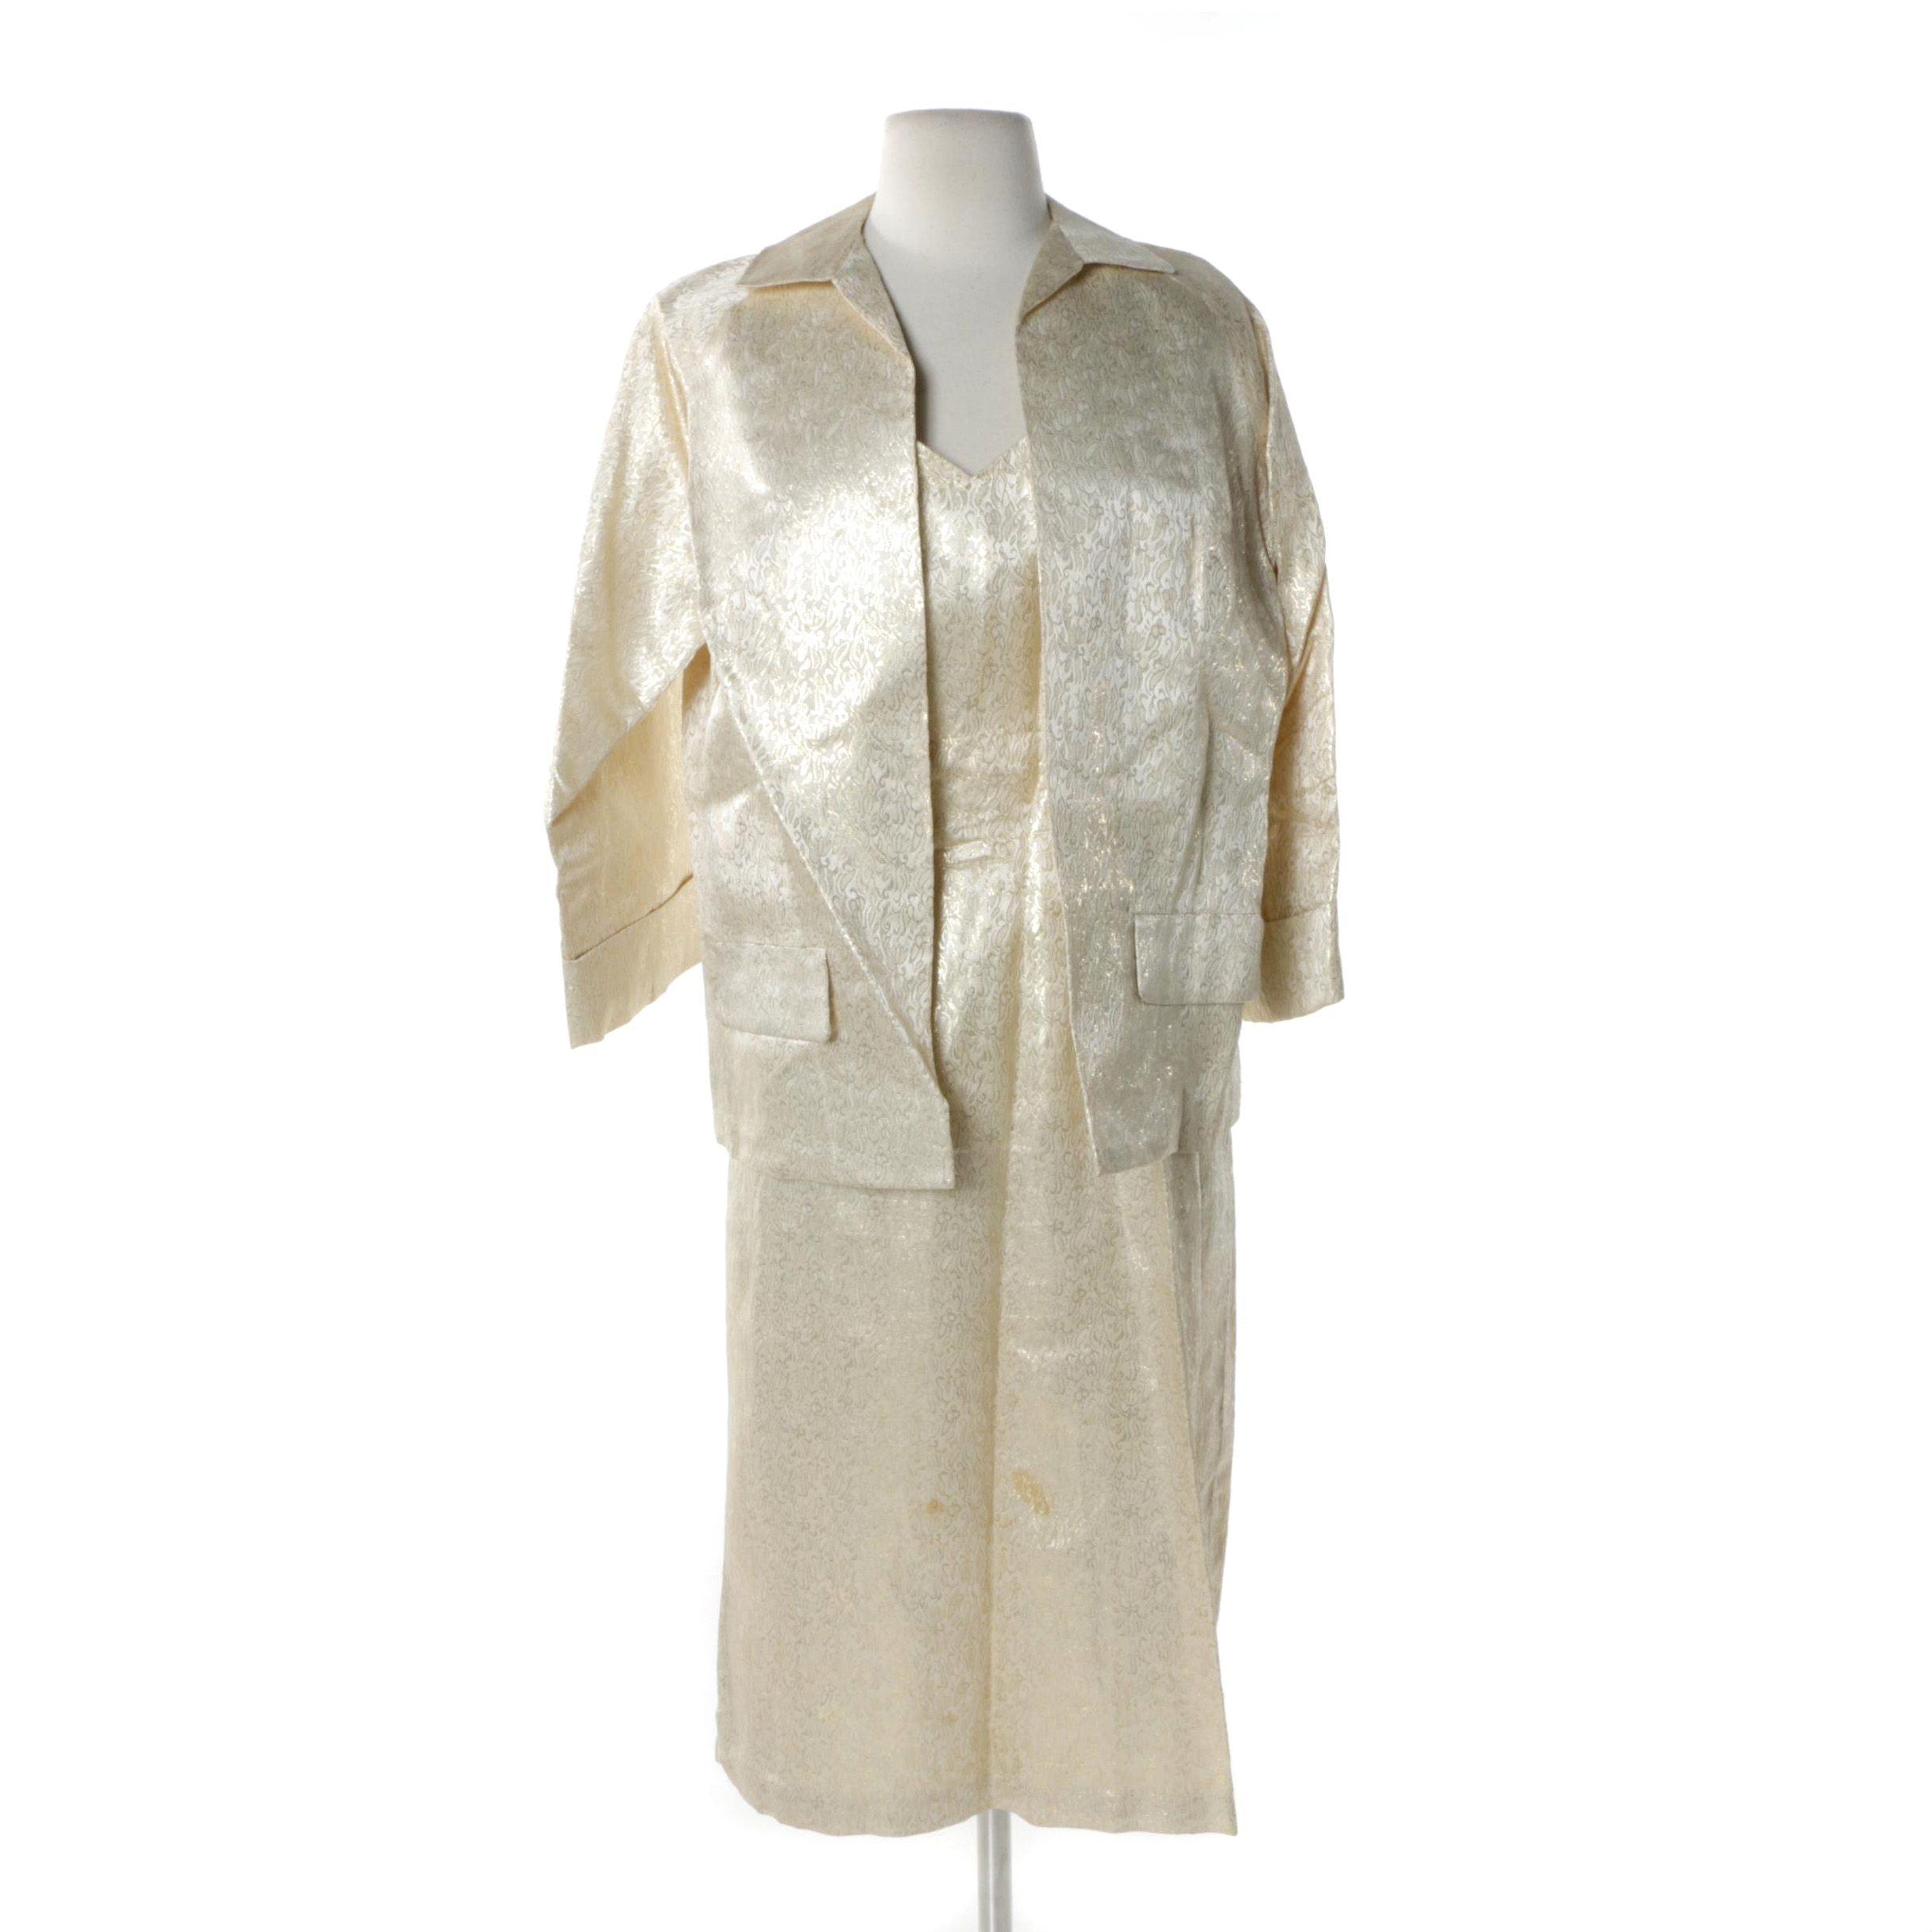 Circa 1950s Vintage Metallic Brocade Cocktail Dress and Jacket